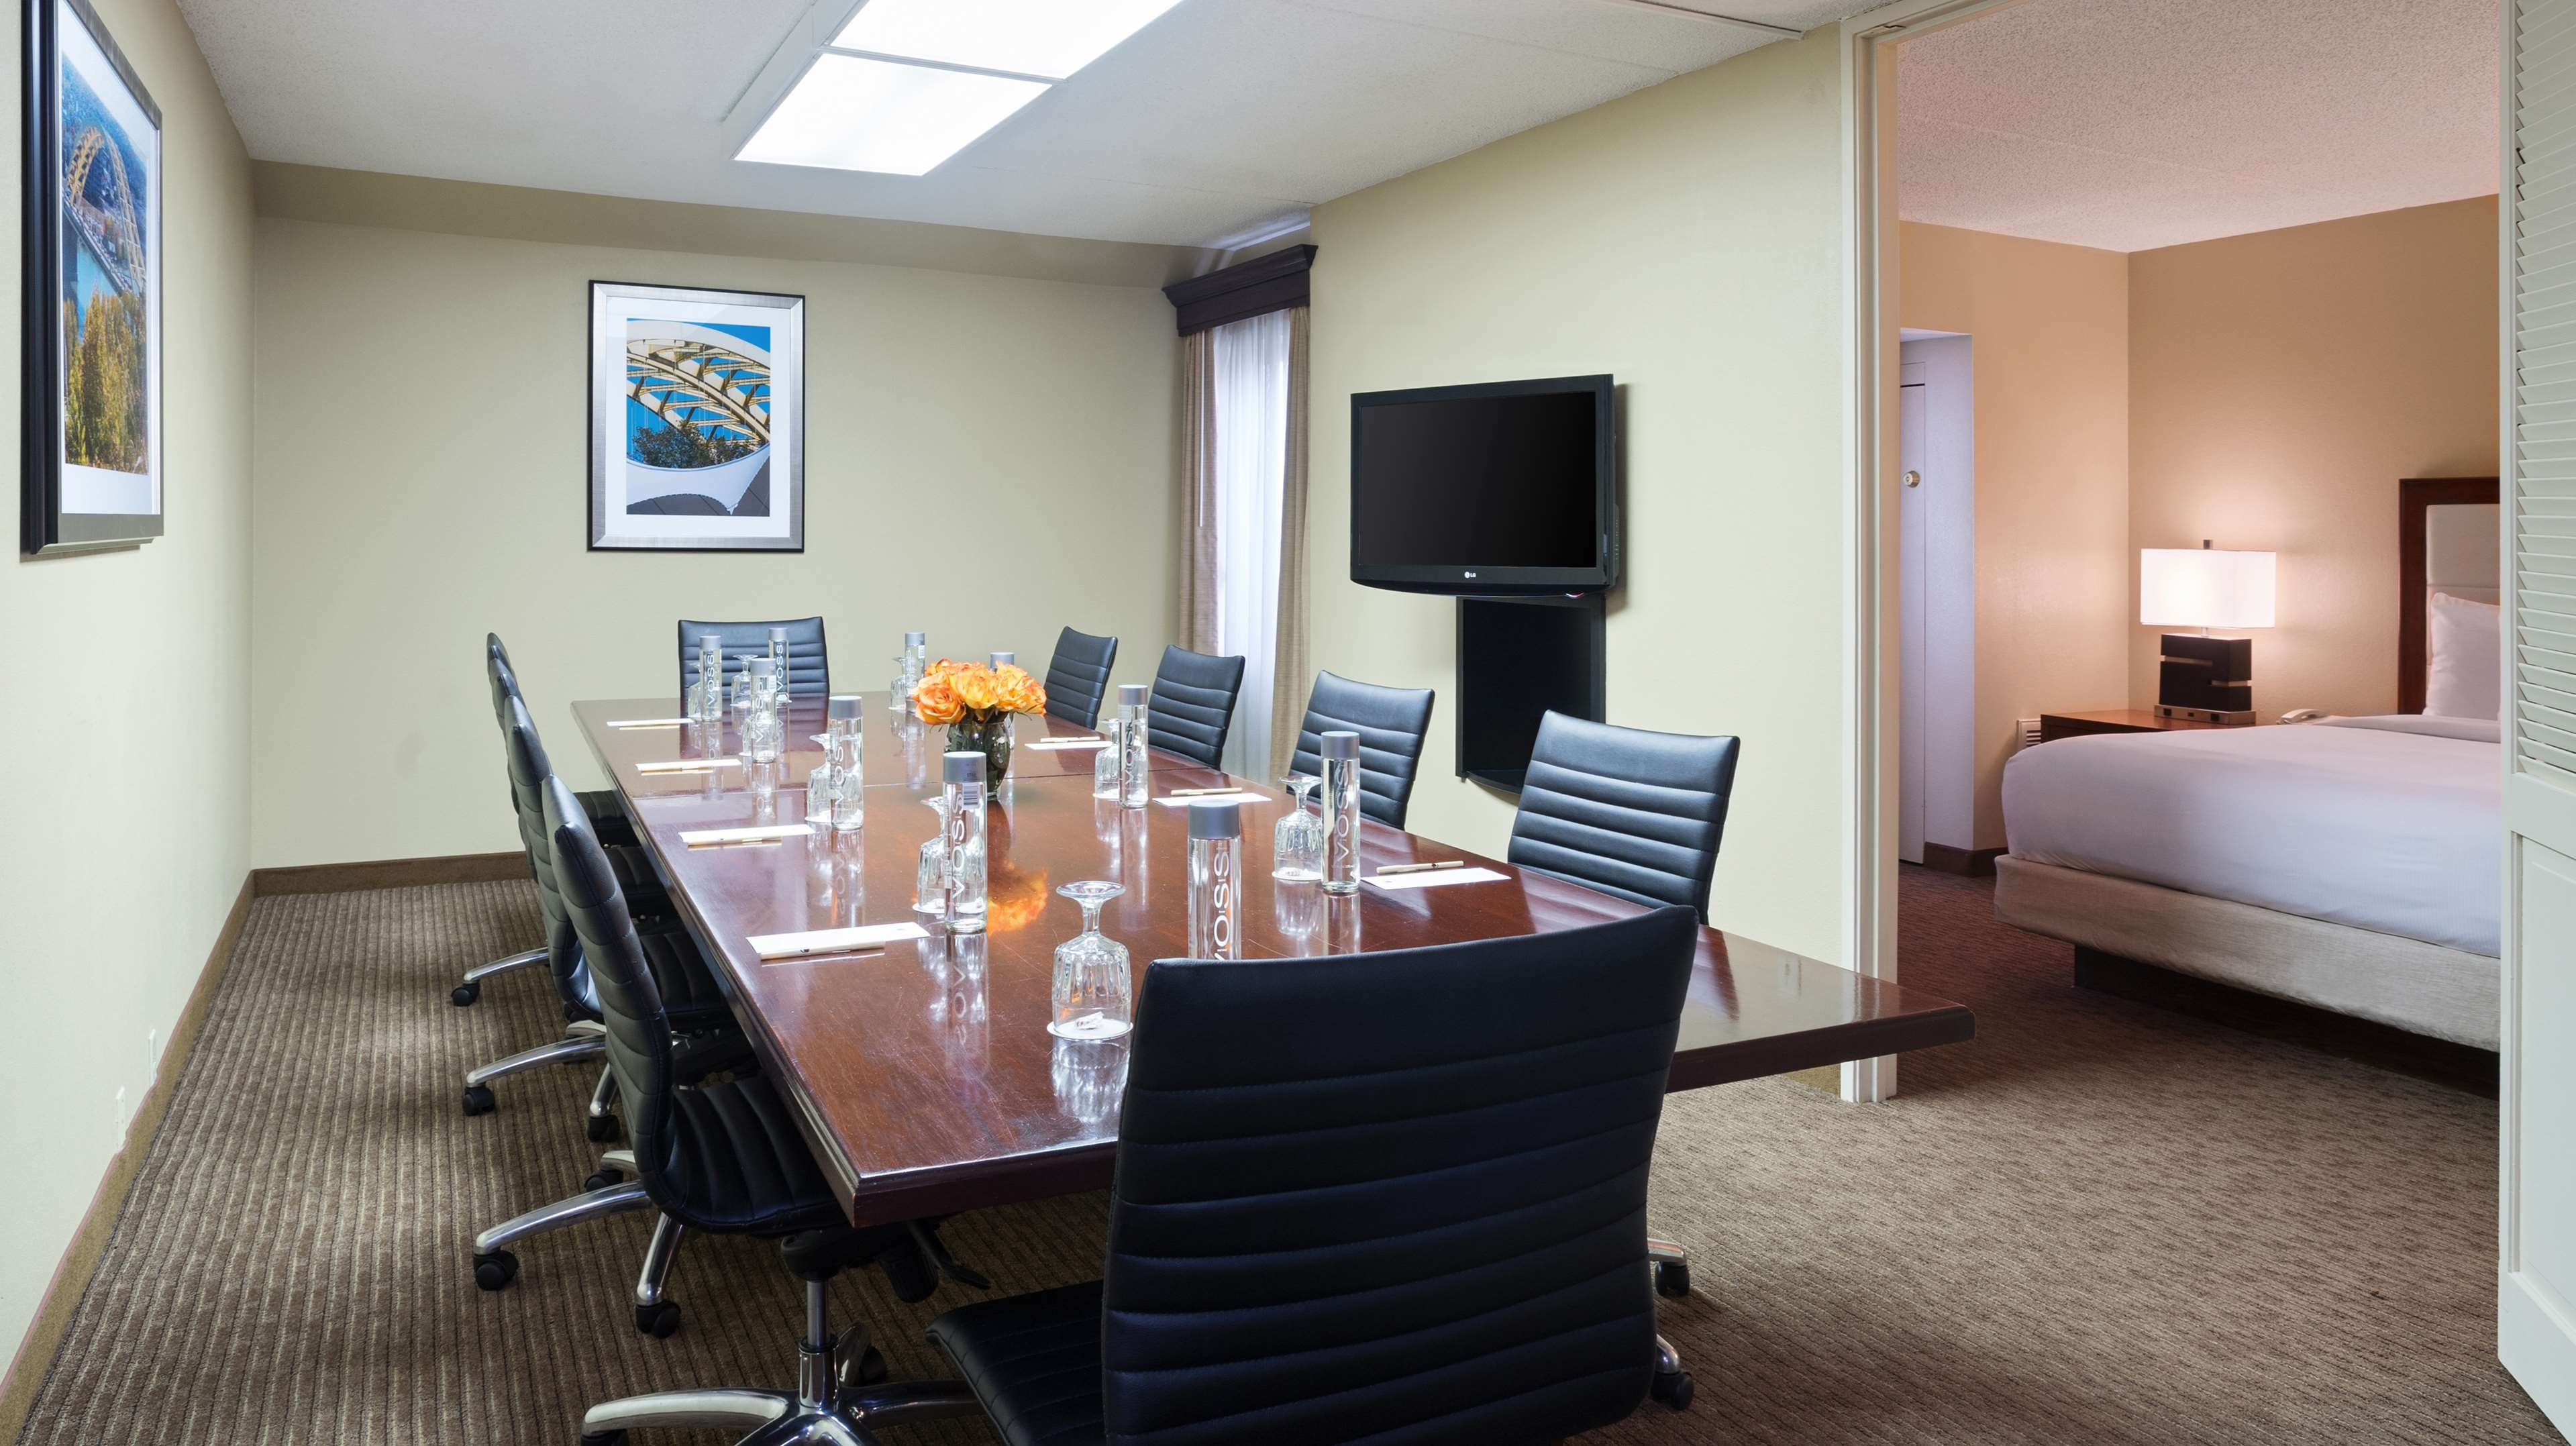 DoubleTree Suites by Hilton Hotel Cincinnati - Blue Ash image 27